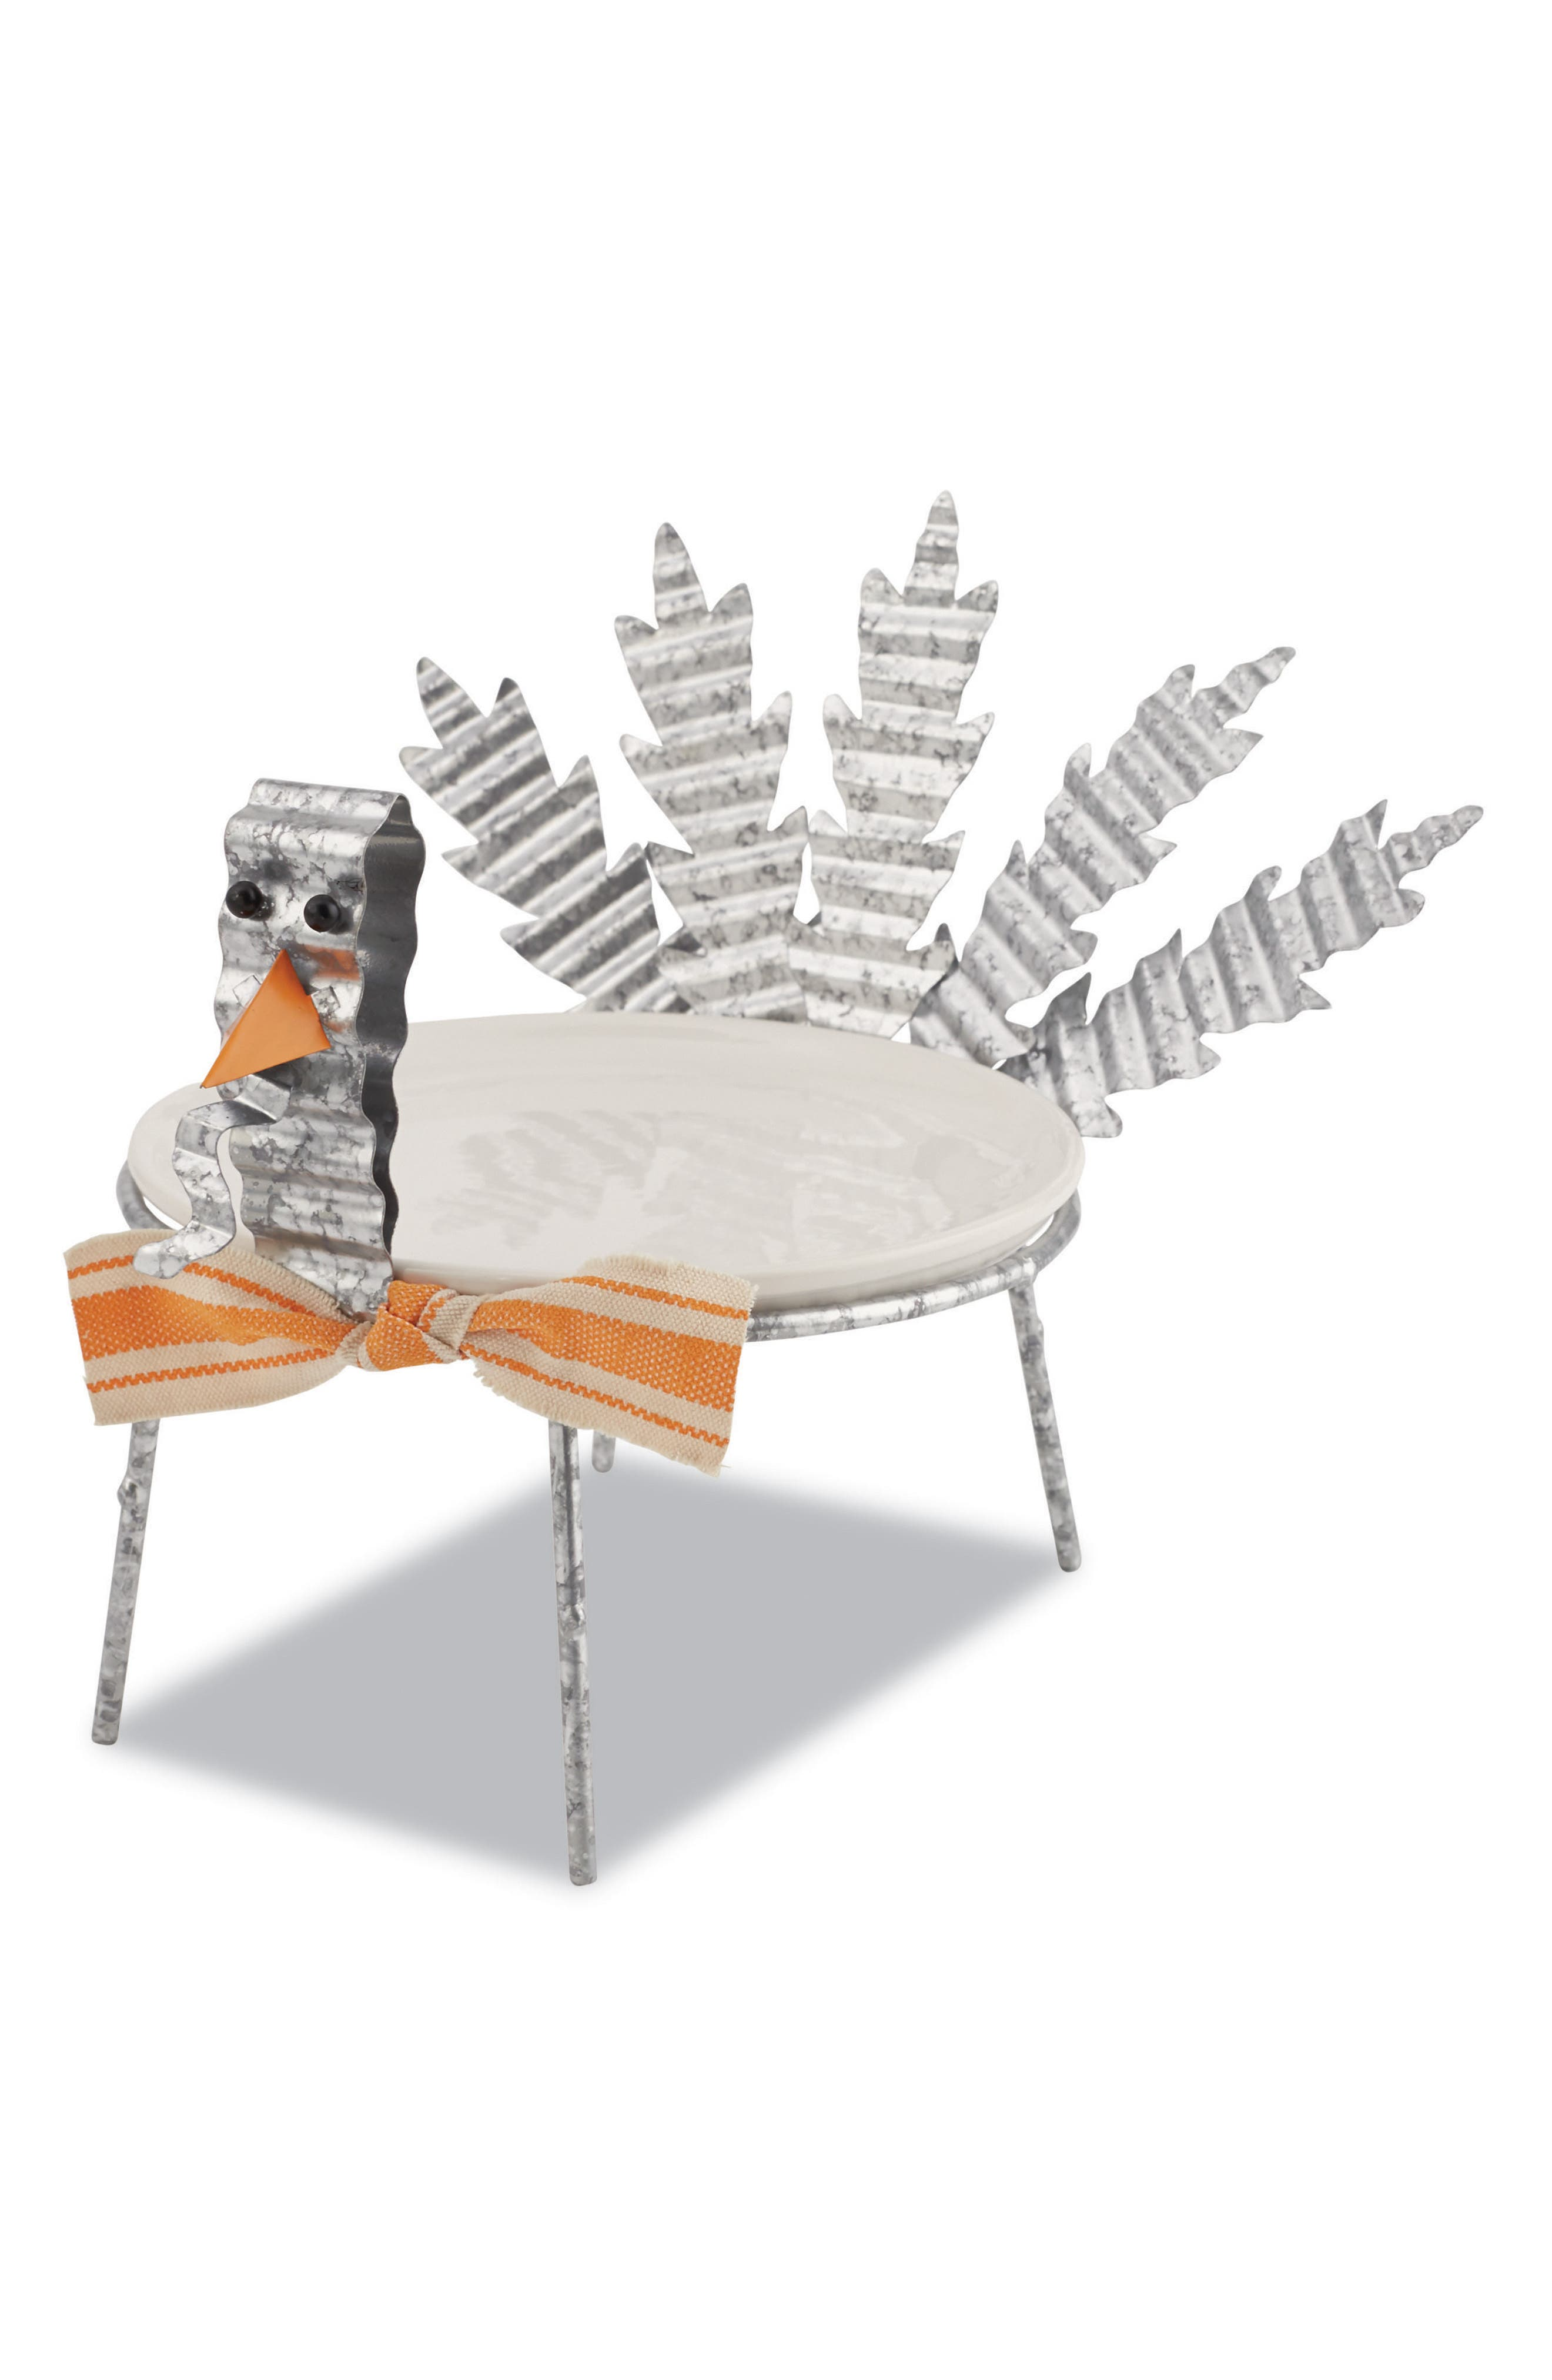 Main Image - Mud Pie Turkey Plate & Stand Set